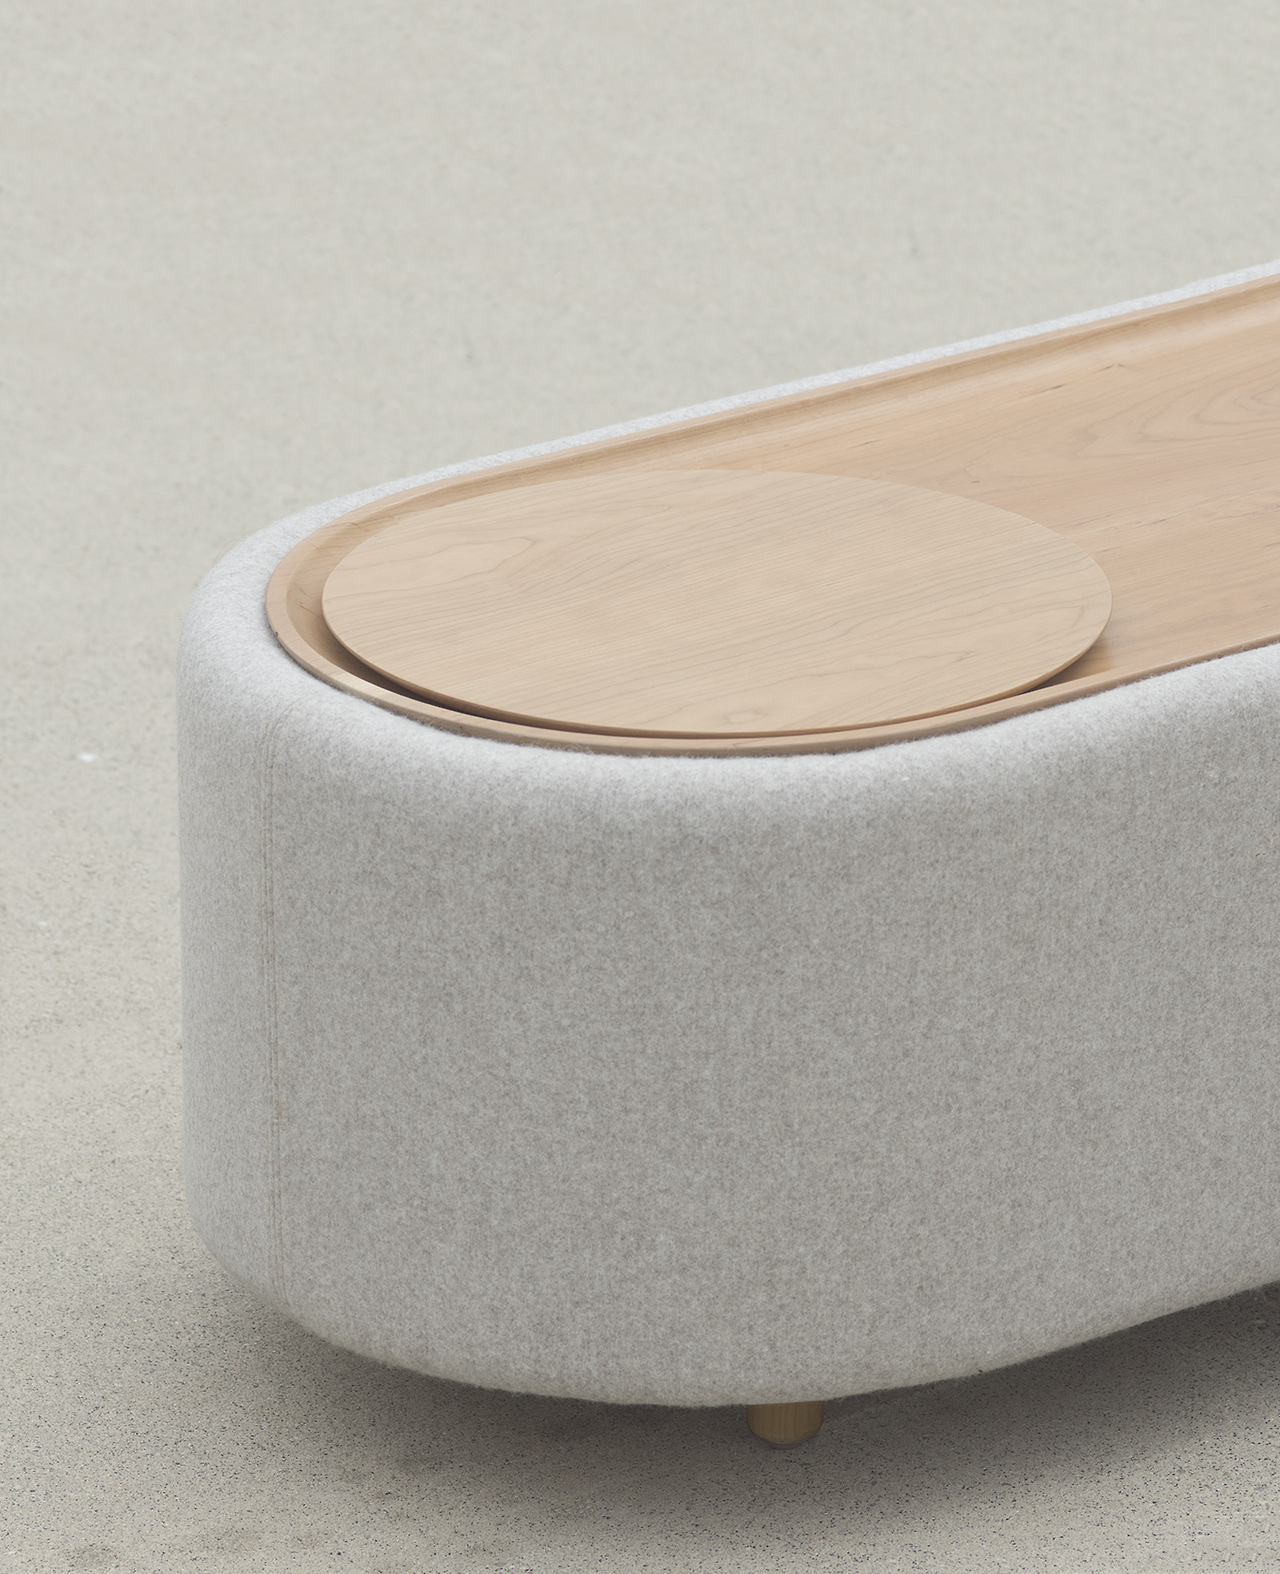 Enjoyable The Lofe Coffee Table By Julie Hong Julie Hong Is Uwap Interior Chair Design Uwaporg